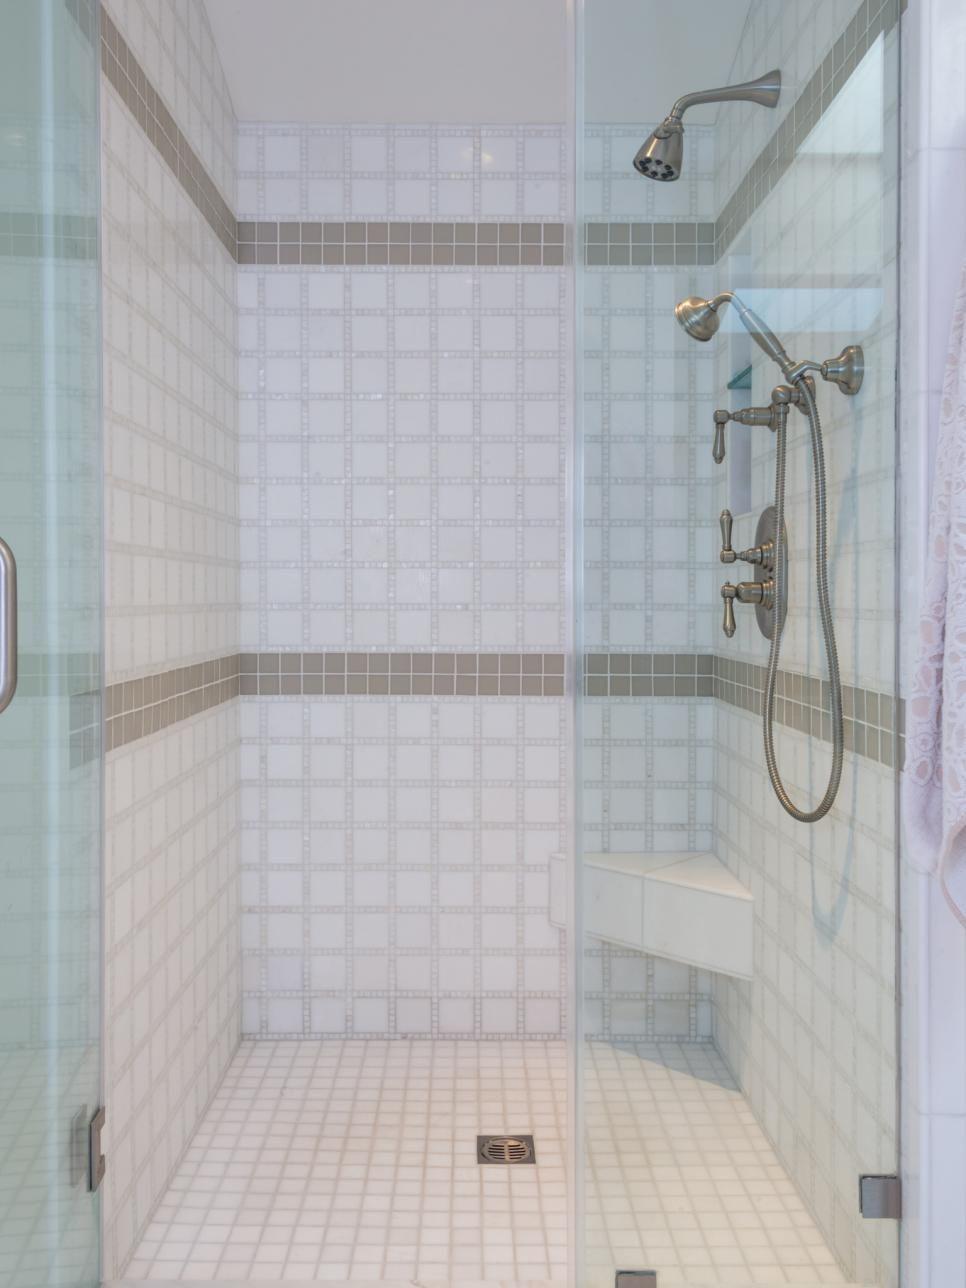 This roomy walkin shower evokes a spalike feel thanks to white